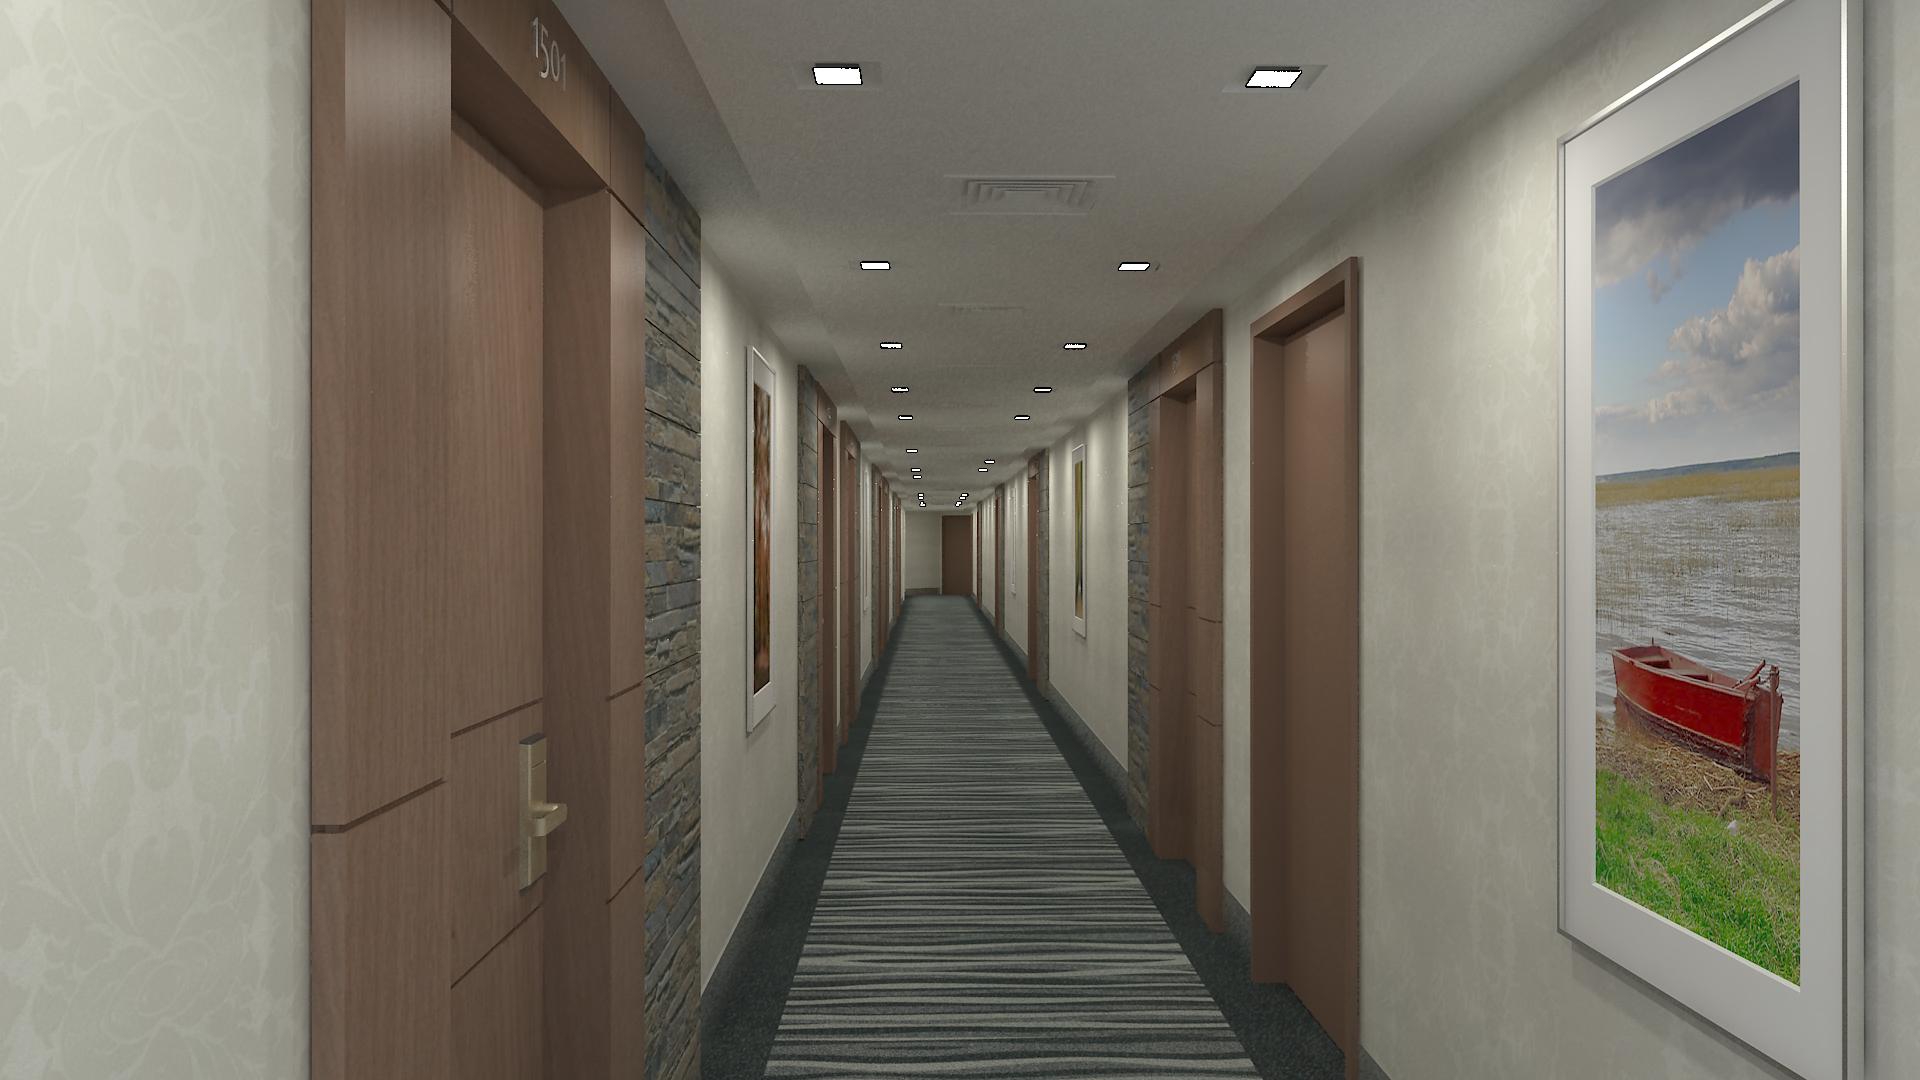 Novotel Typical Corridor 01